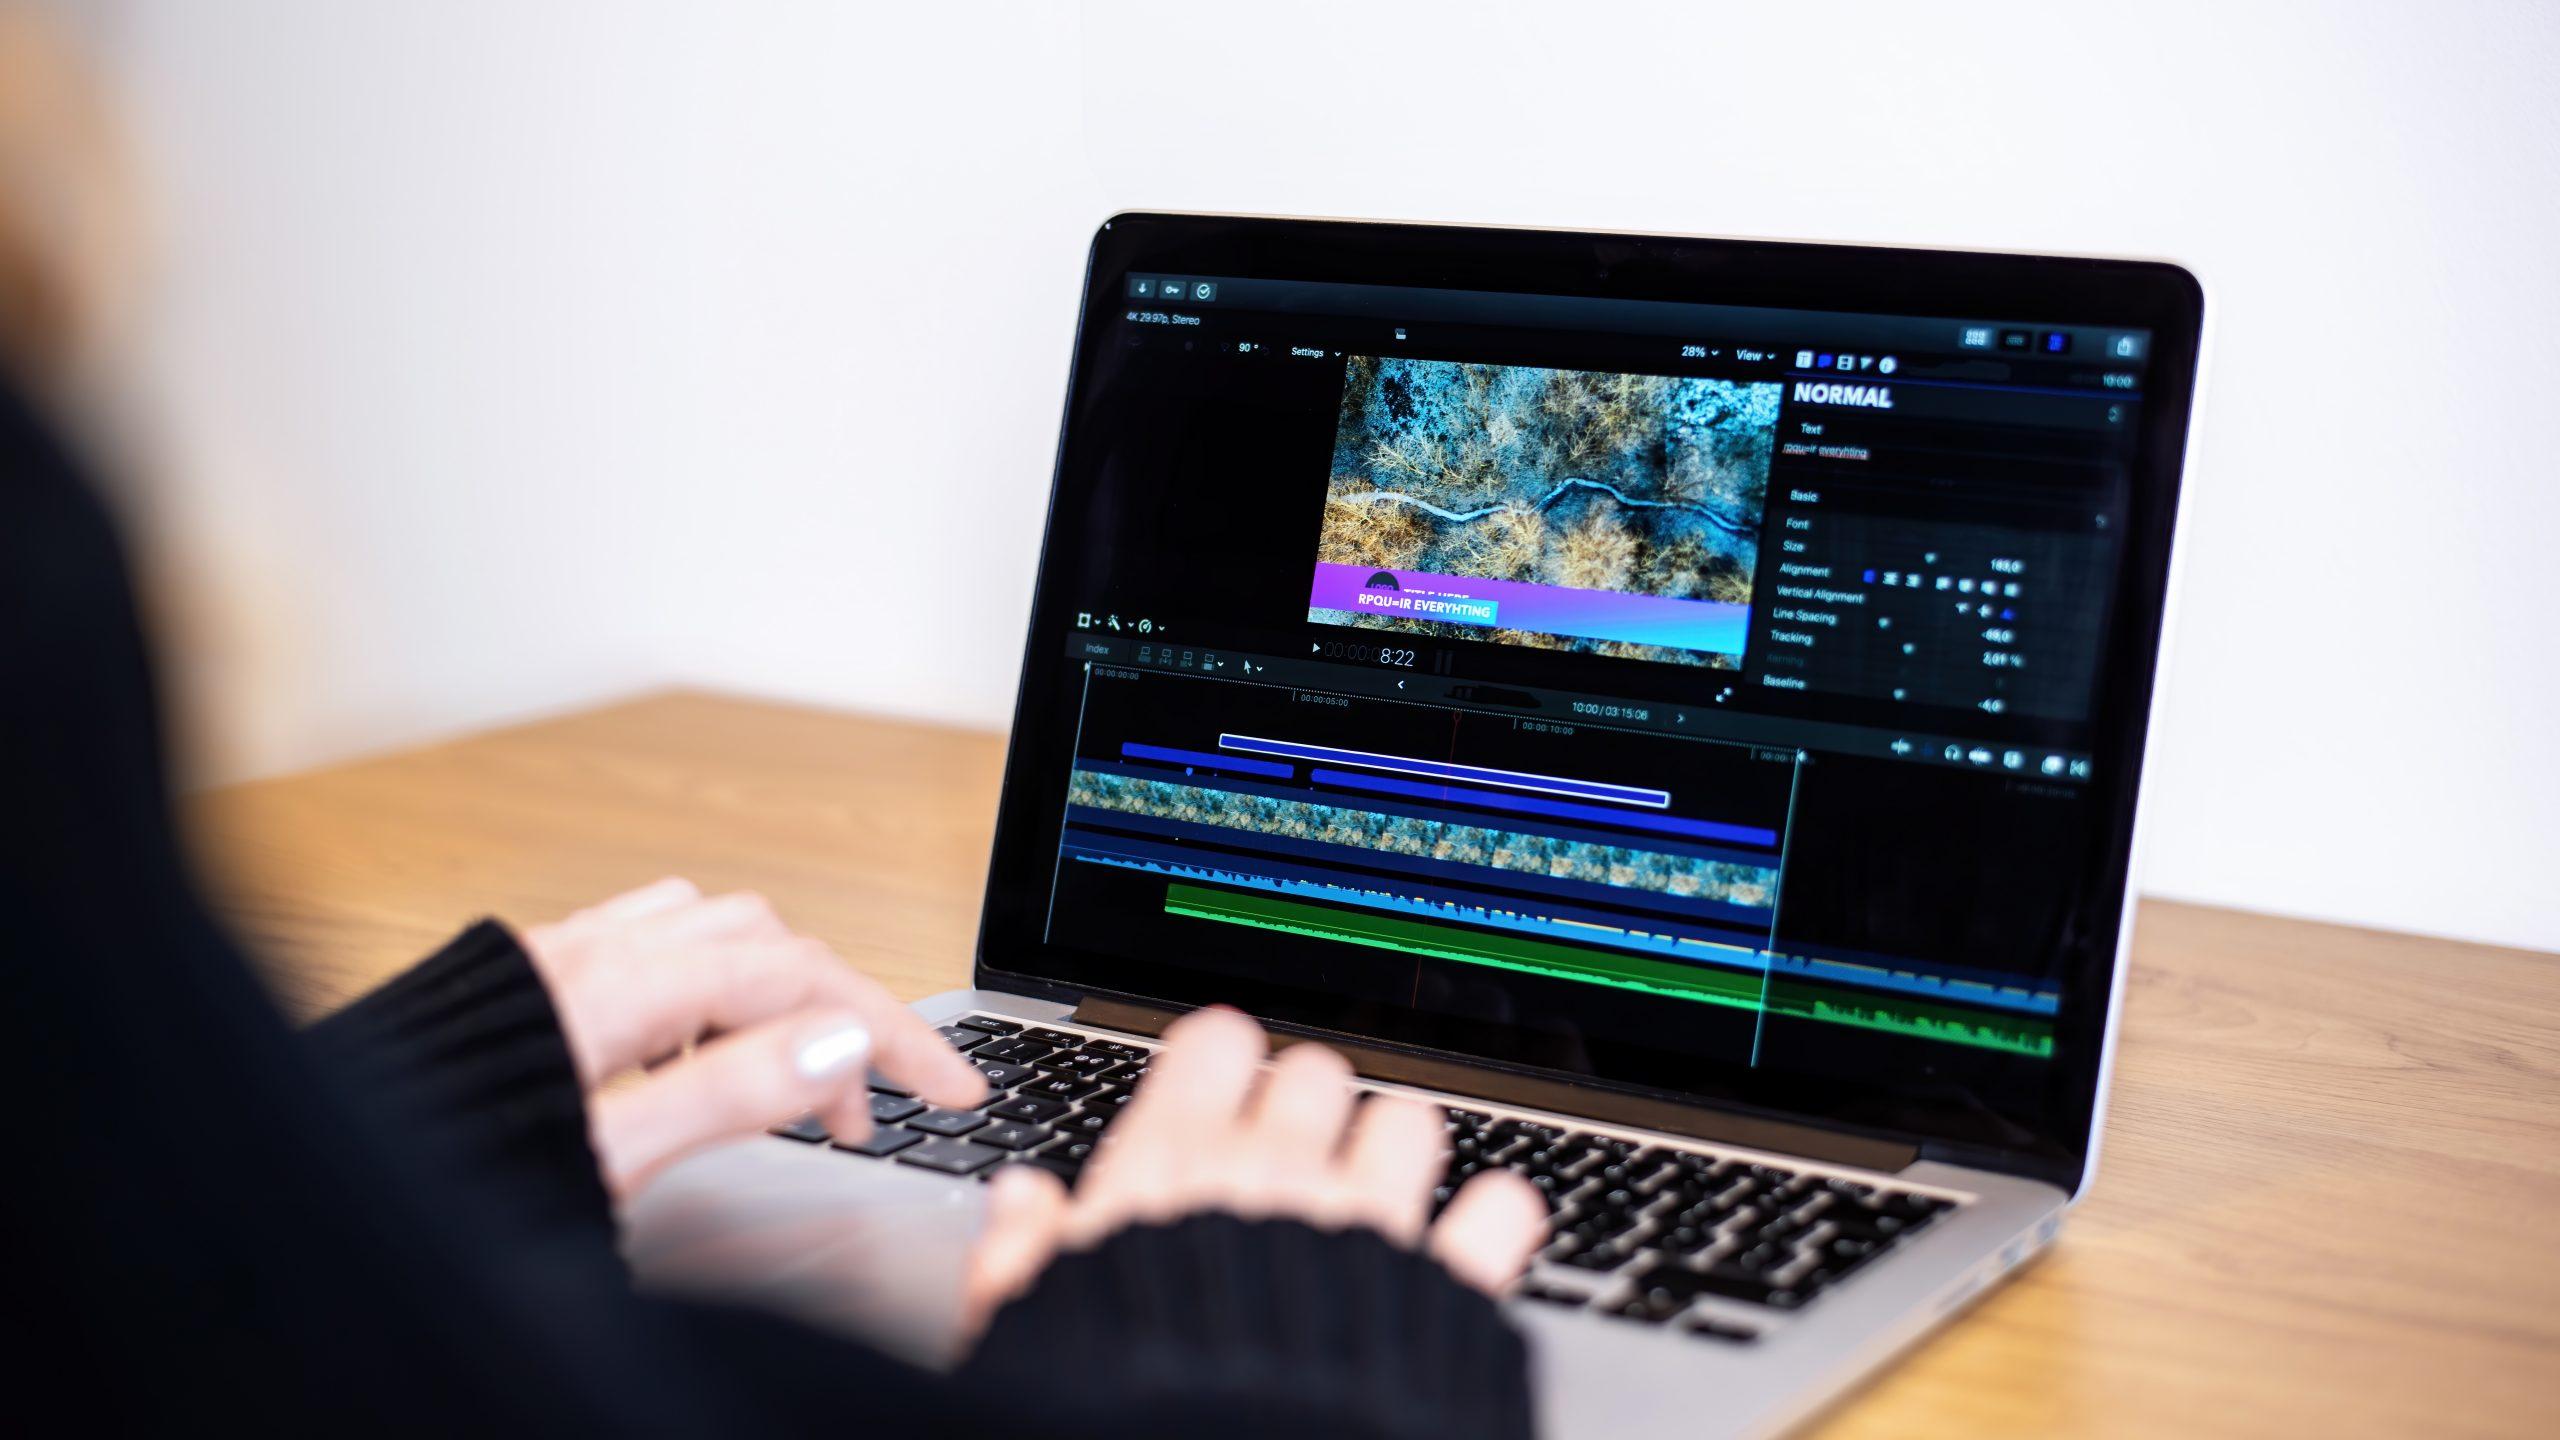 young content creator girl editing video her laptop working from home scaled - برنامج تعديل الفيديو بدون علامة مائية للكمبيوتر 5 برامج احترافية